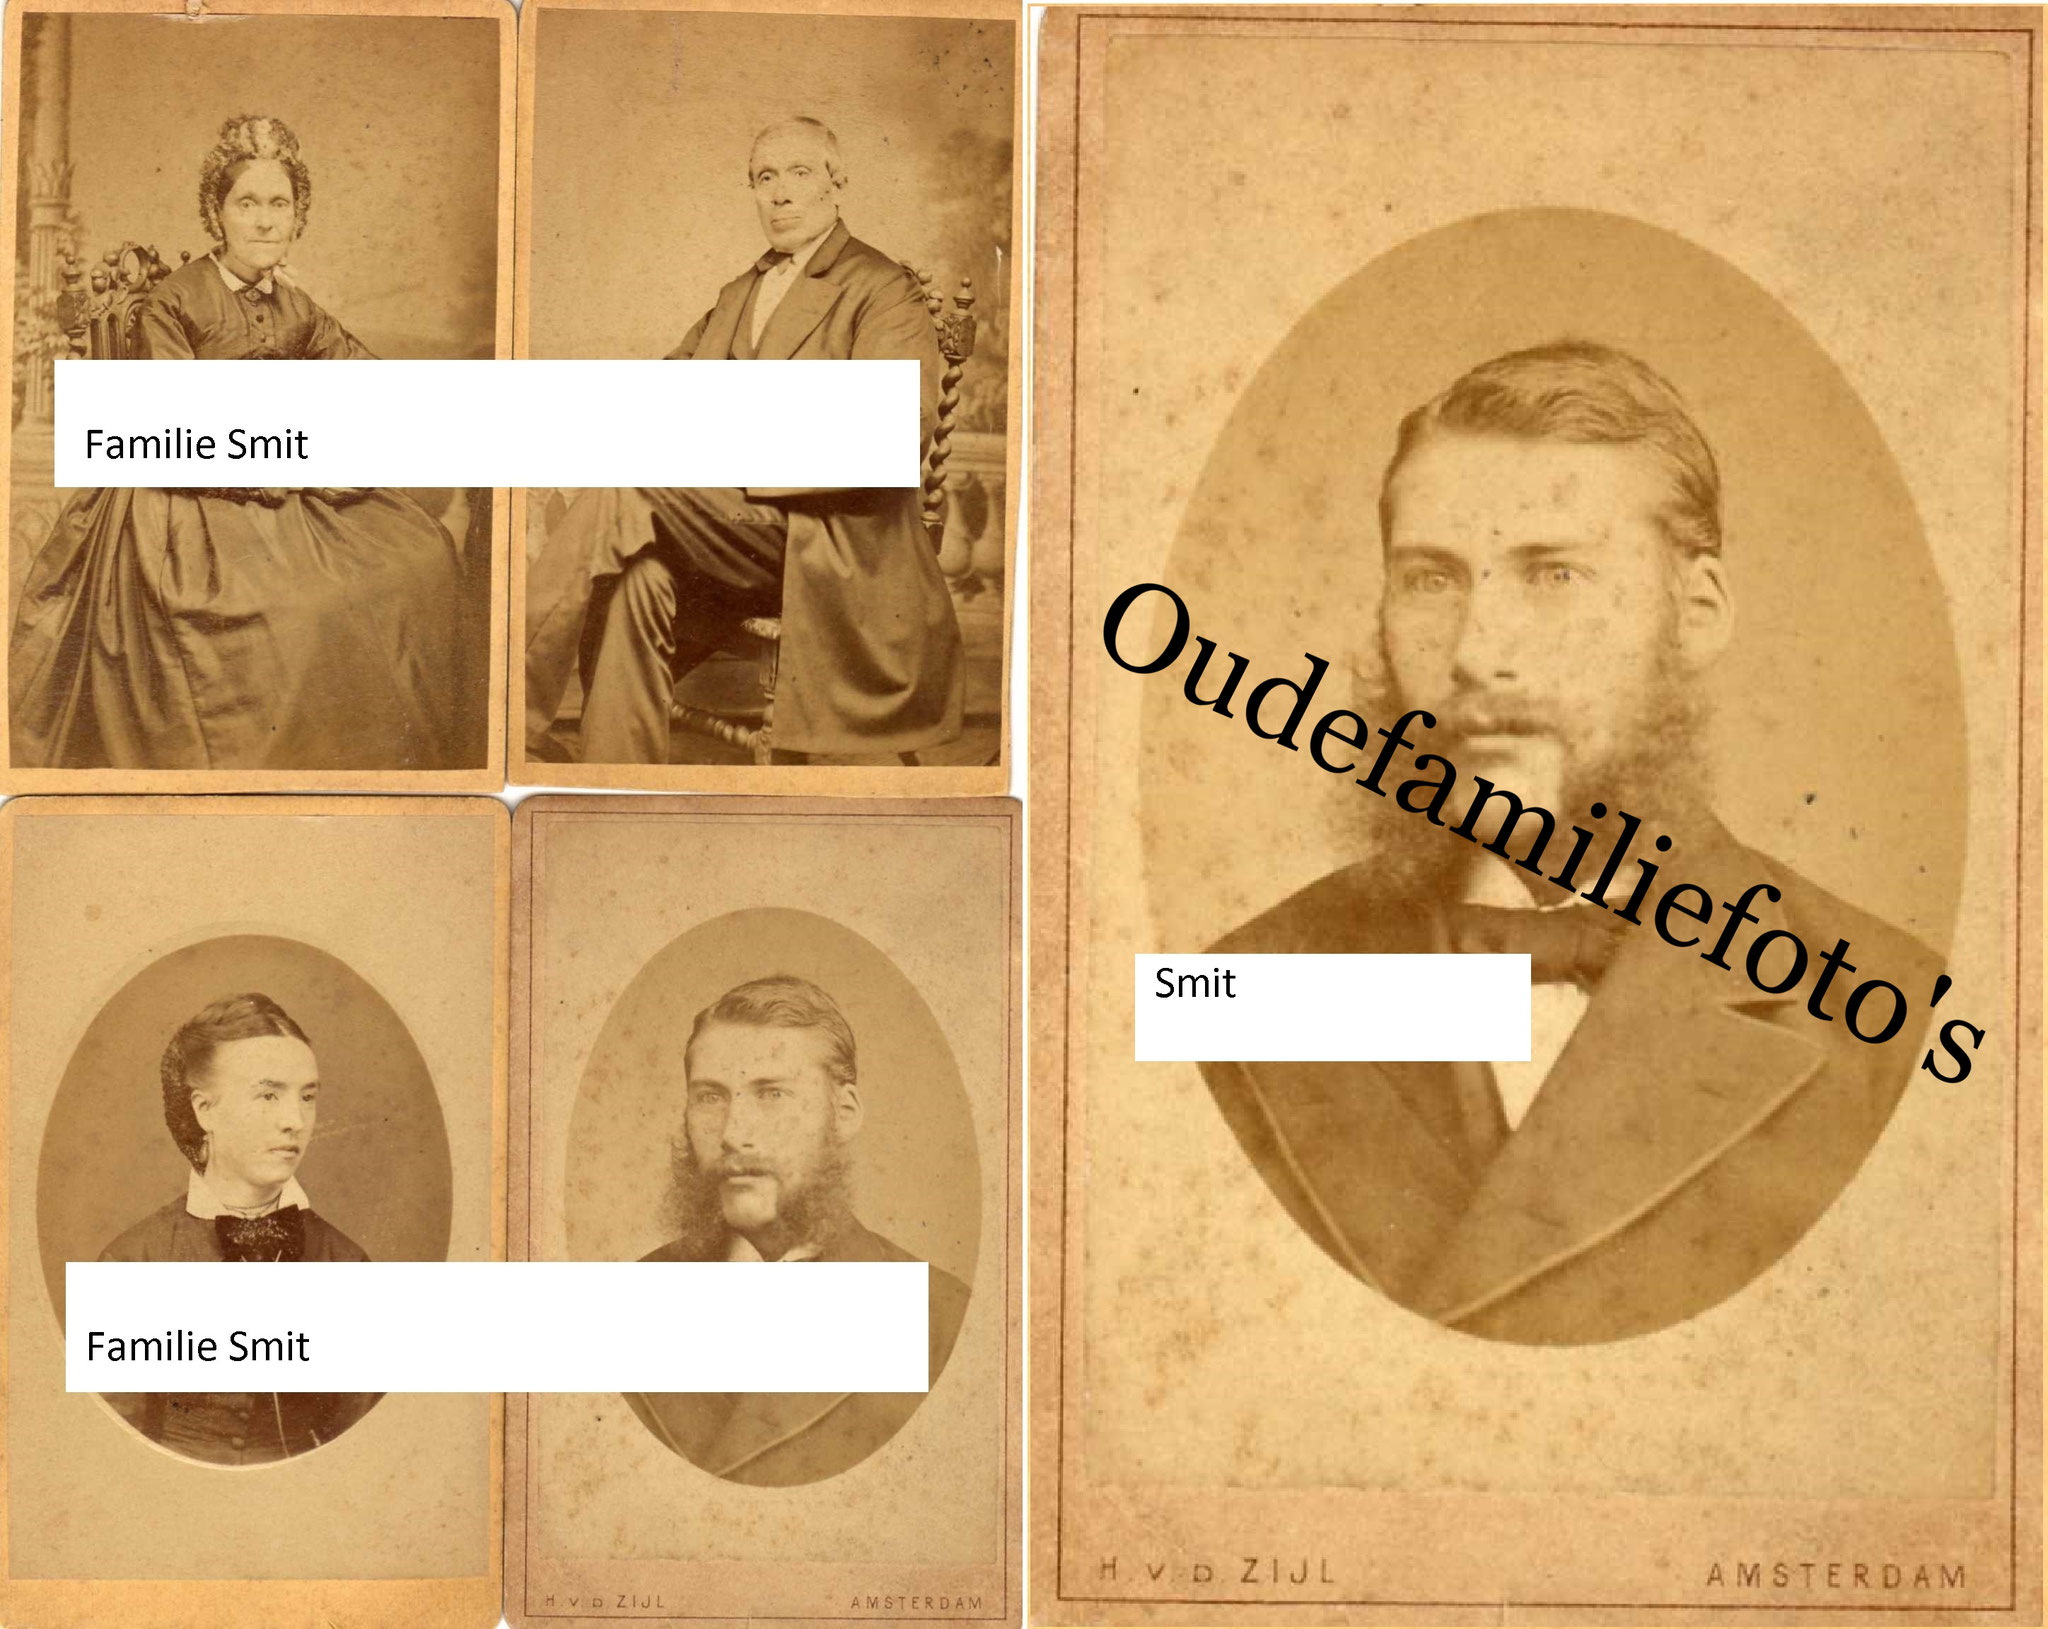 Smit, Frederik Otto. Geb. 8-5-1858 Ovl. 10-1-1938 Getrouwd 21-5-1879 Amsterdam met Catharina Christina Harmsen € gratis voor aantoonbare familie.